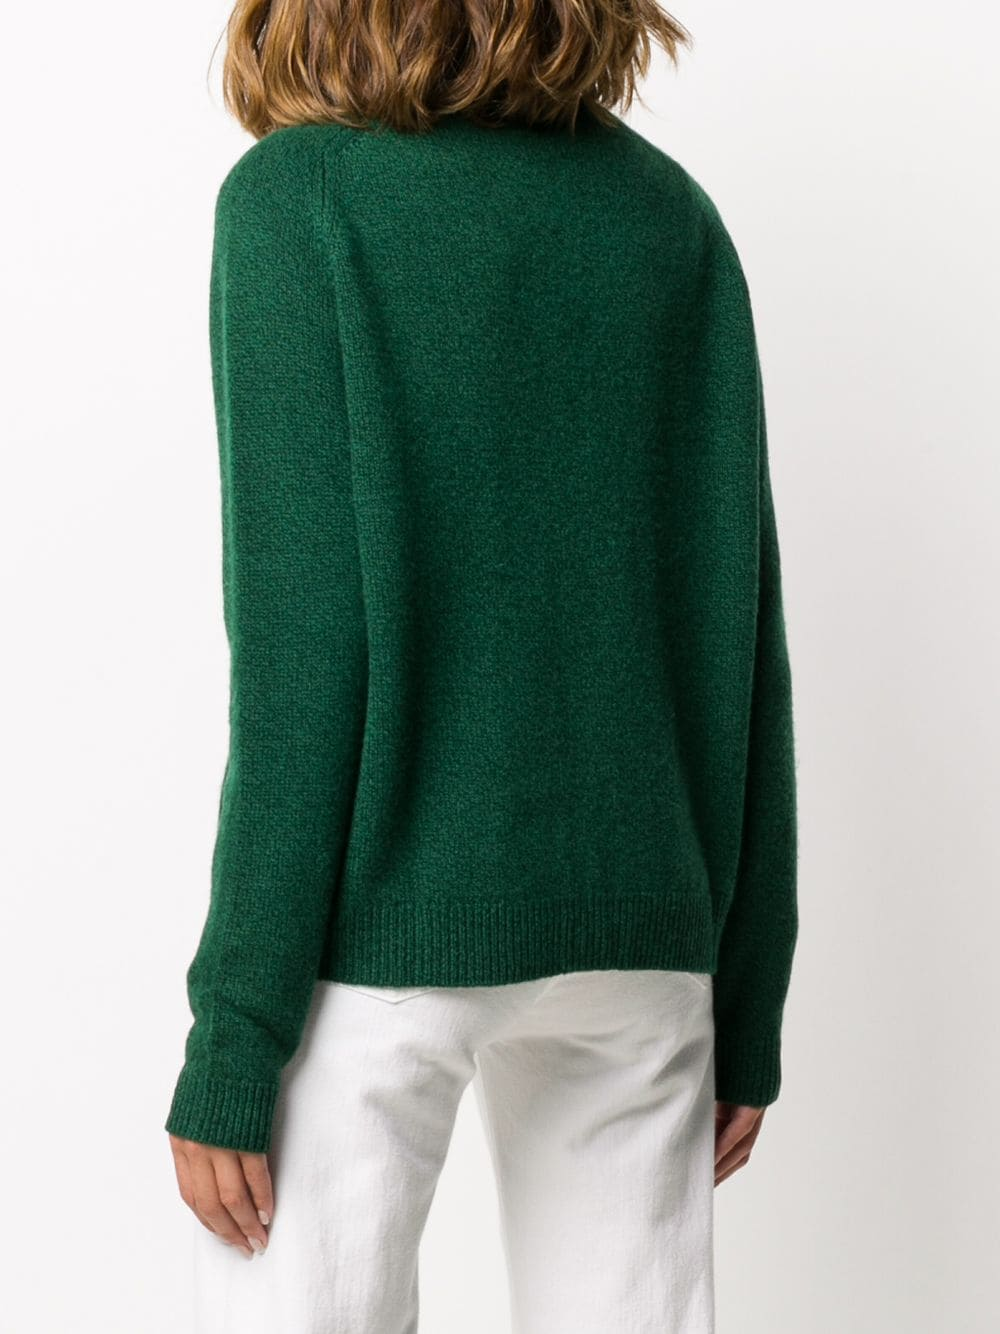 Dark green rib-trimmed wool cardigan featuring V-neck ALBERTO ASPESI |  | 5050-562385397